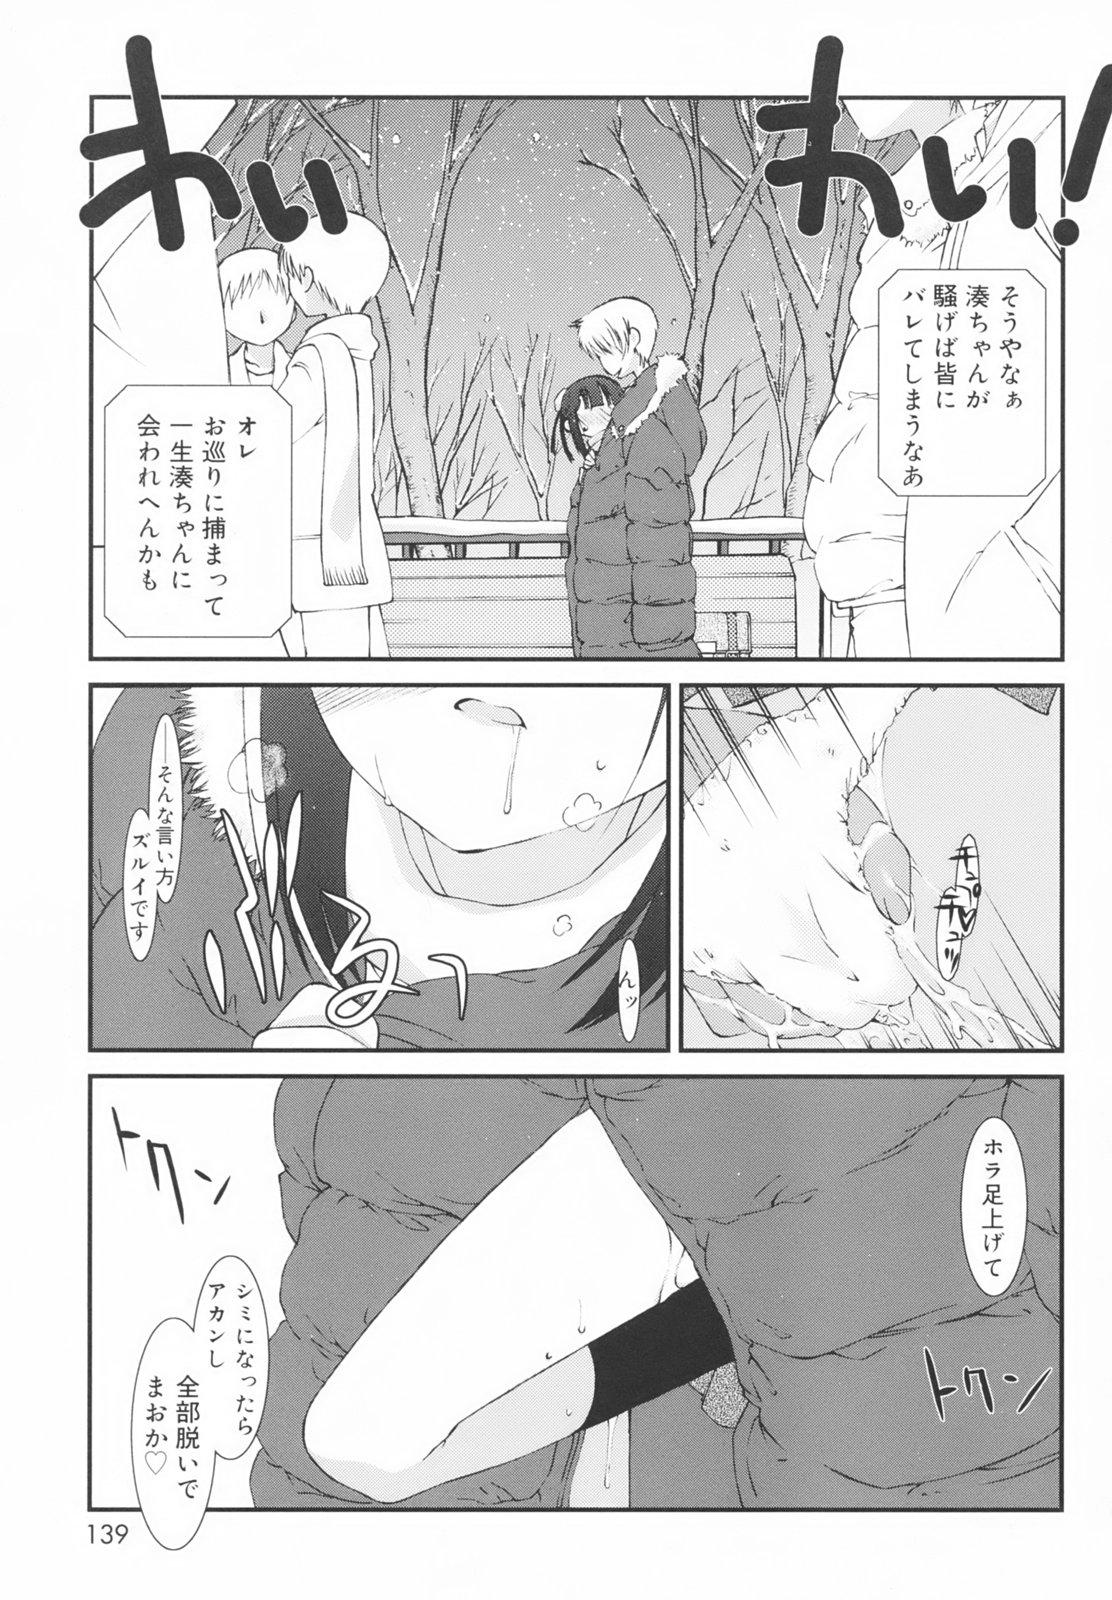 Gakkou No Nai Hi - A Day without School 142